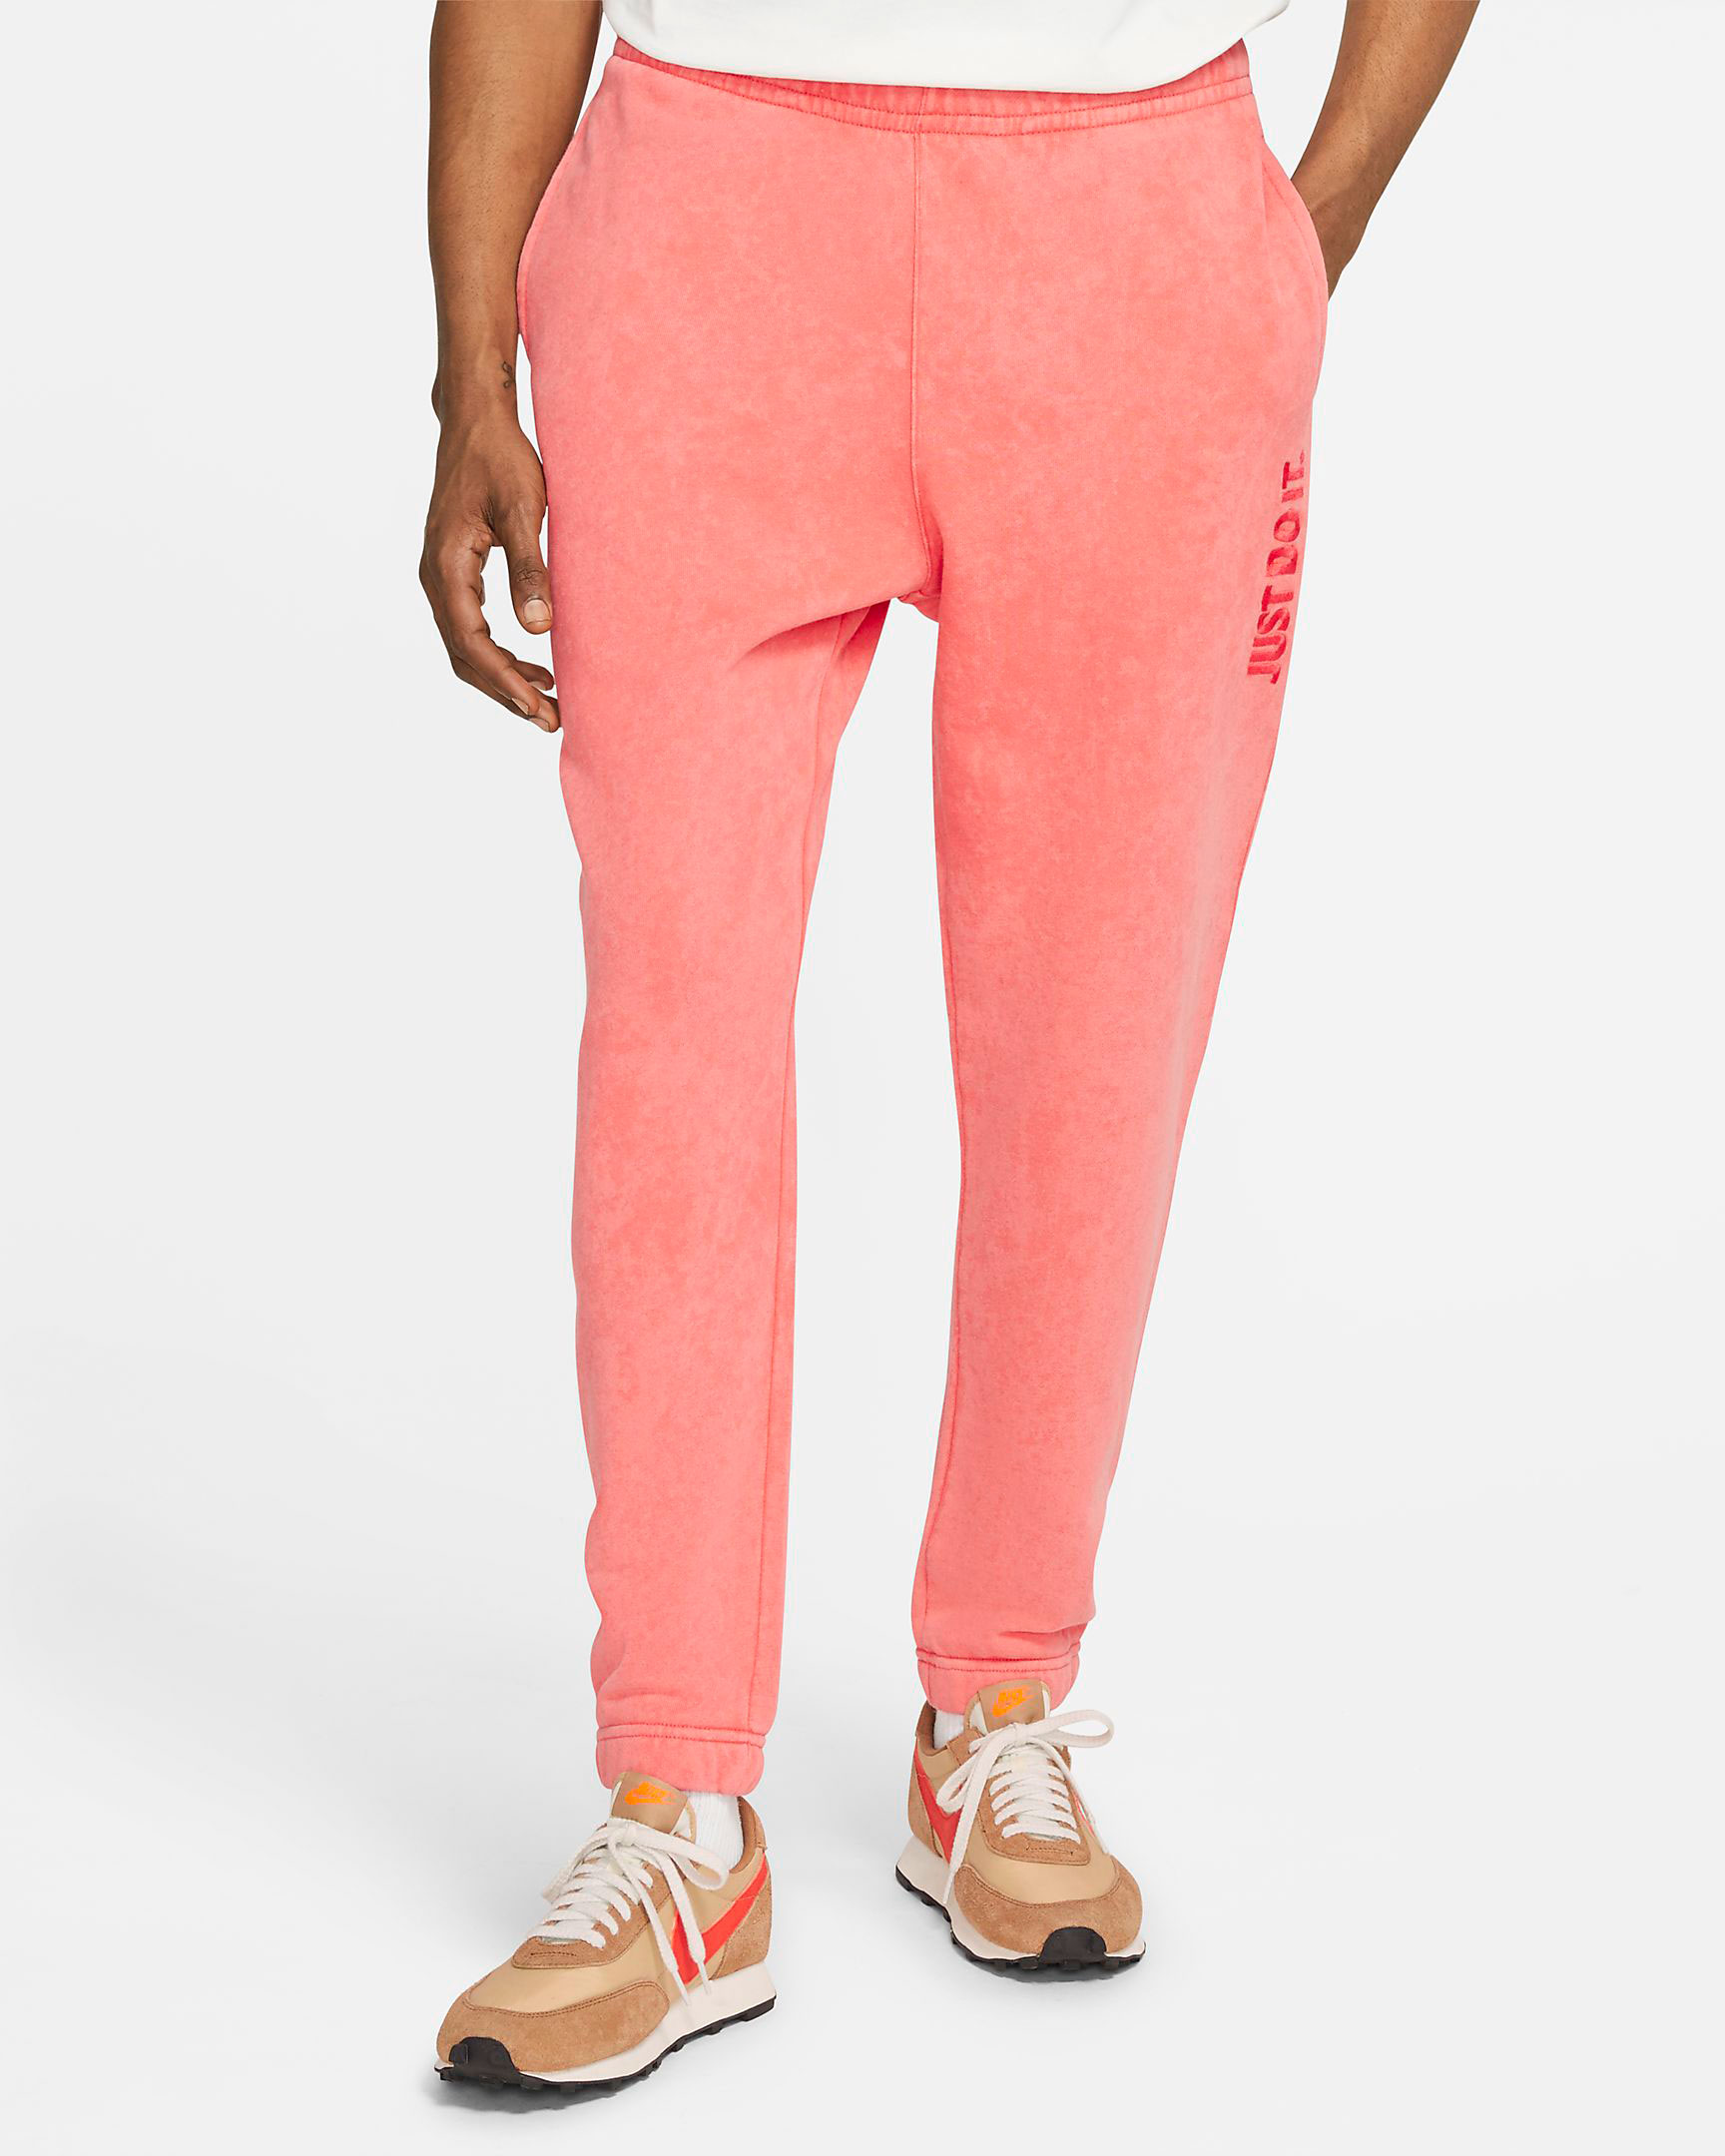 nike-jdi-just-do-it-jogger-pants-infrared-ember-2